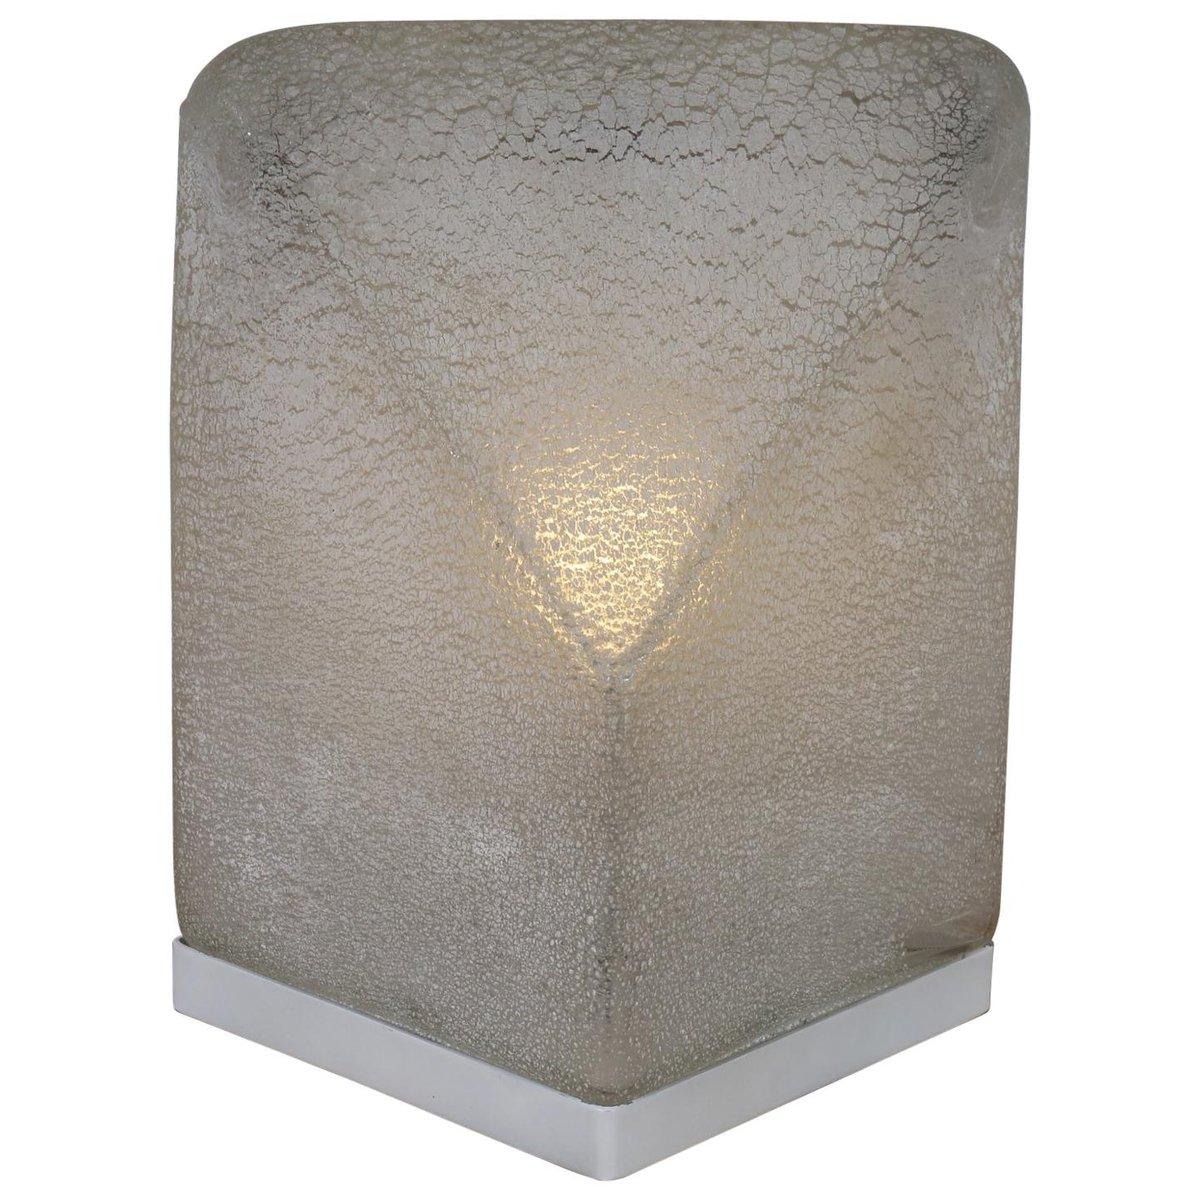 Tischlampe aus Muranoglas von Alfredo Barbini, 1970er